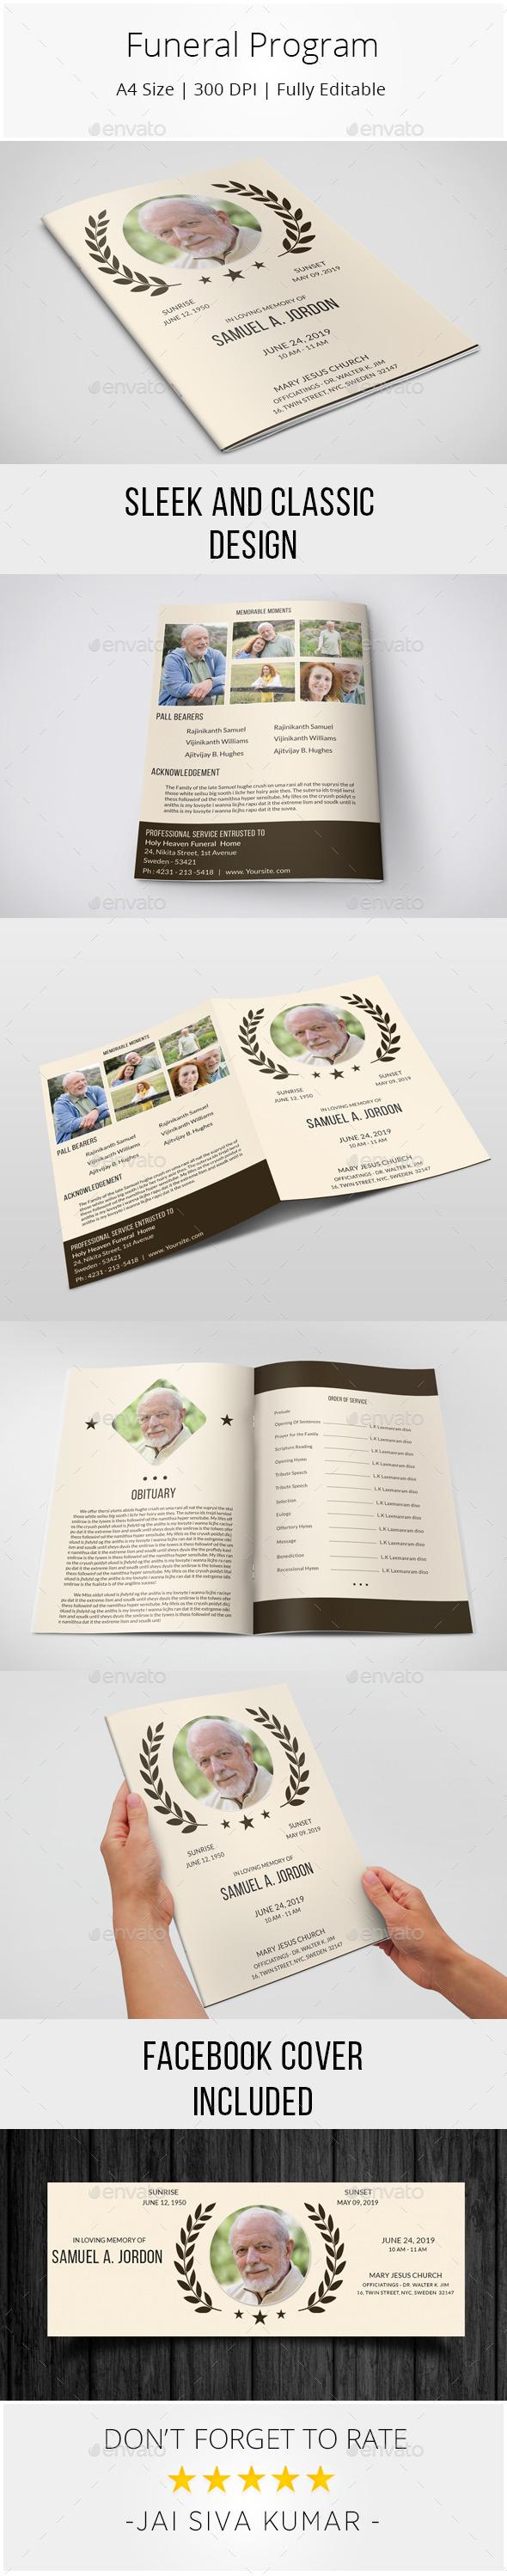 GraphicRiver Funeral Program Template 10124999